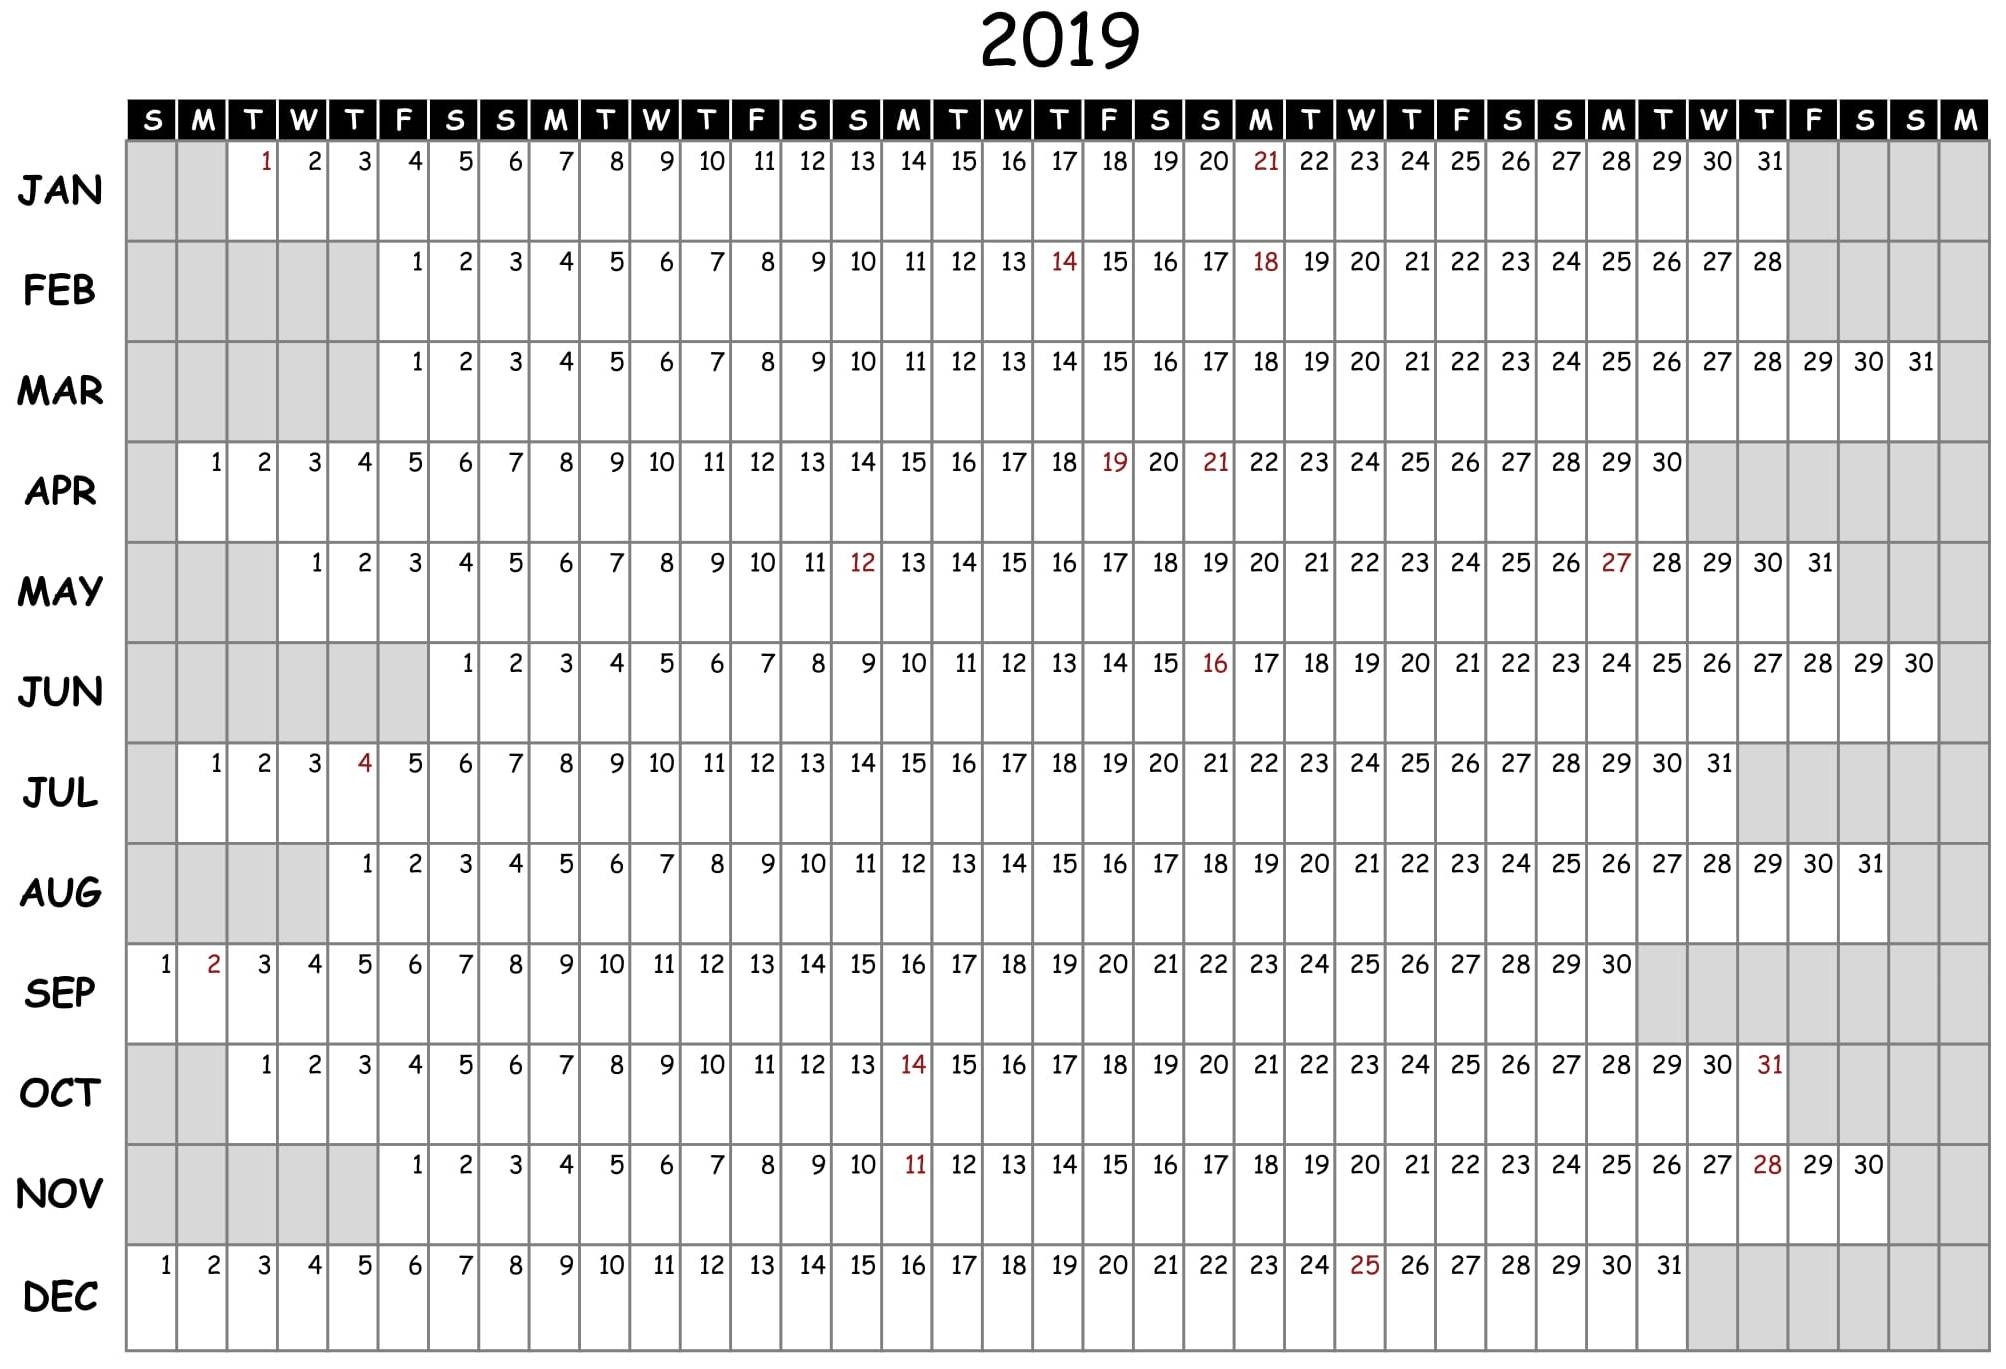 Free Printable 2020 Employee Attendance Calendar - Colona regarding Printable Employee Attendance Calendar 2020